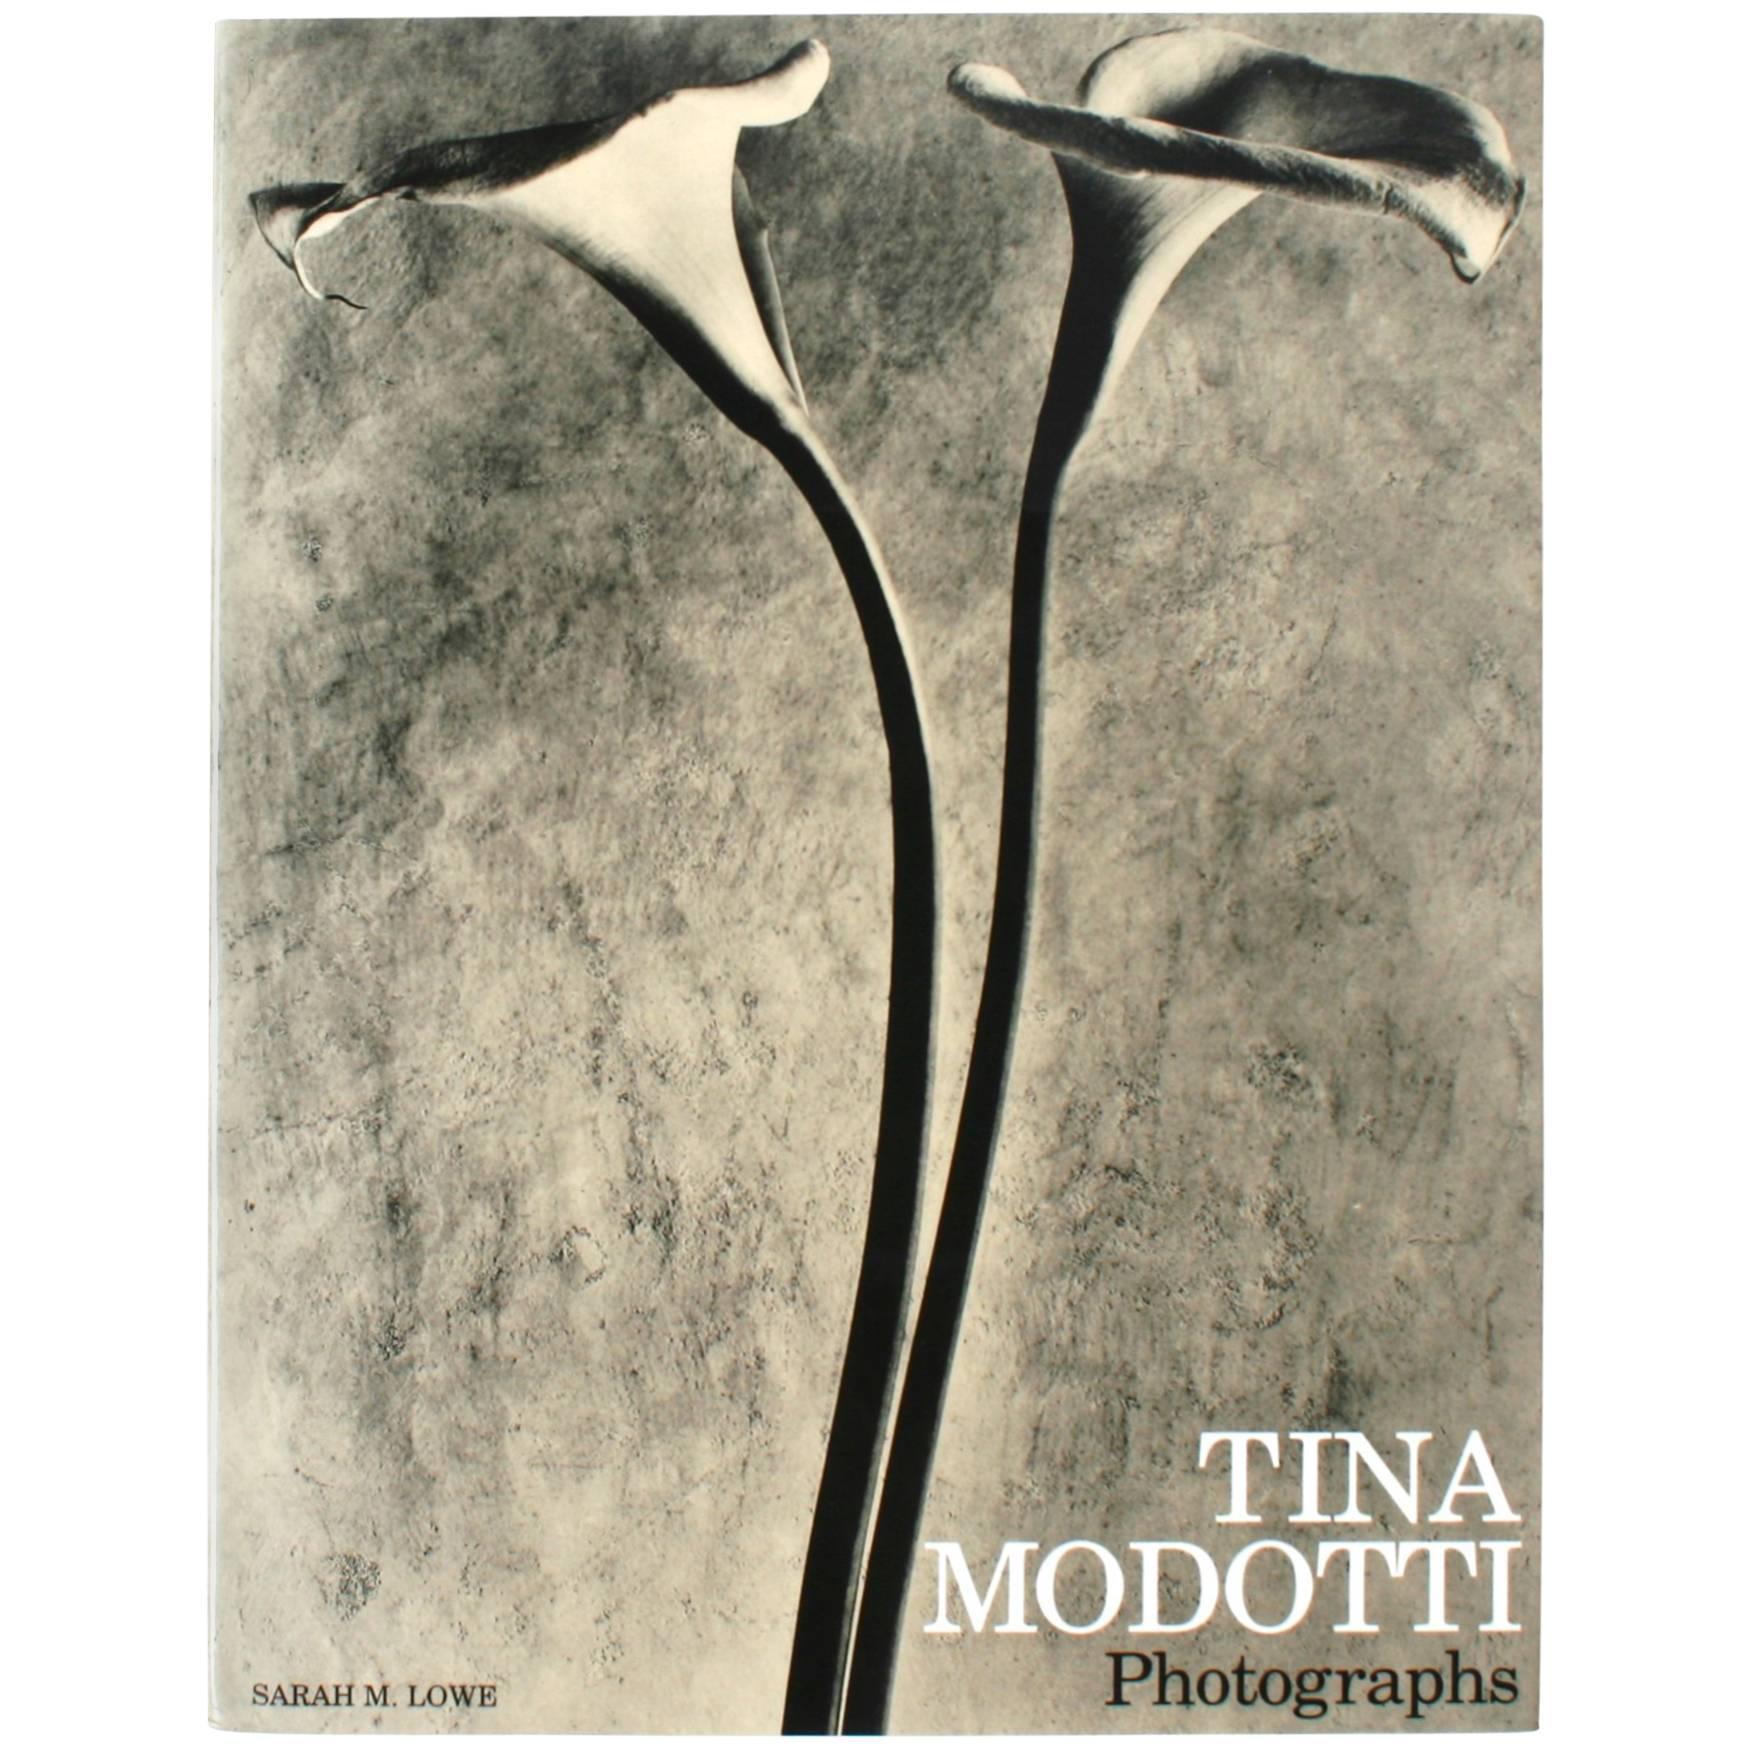 Tina Modotti Photographs, Sarah Lowe, 1st Ed